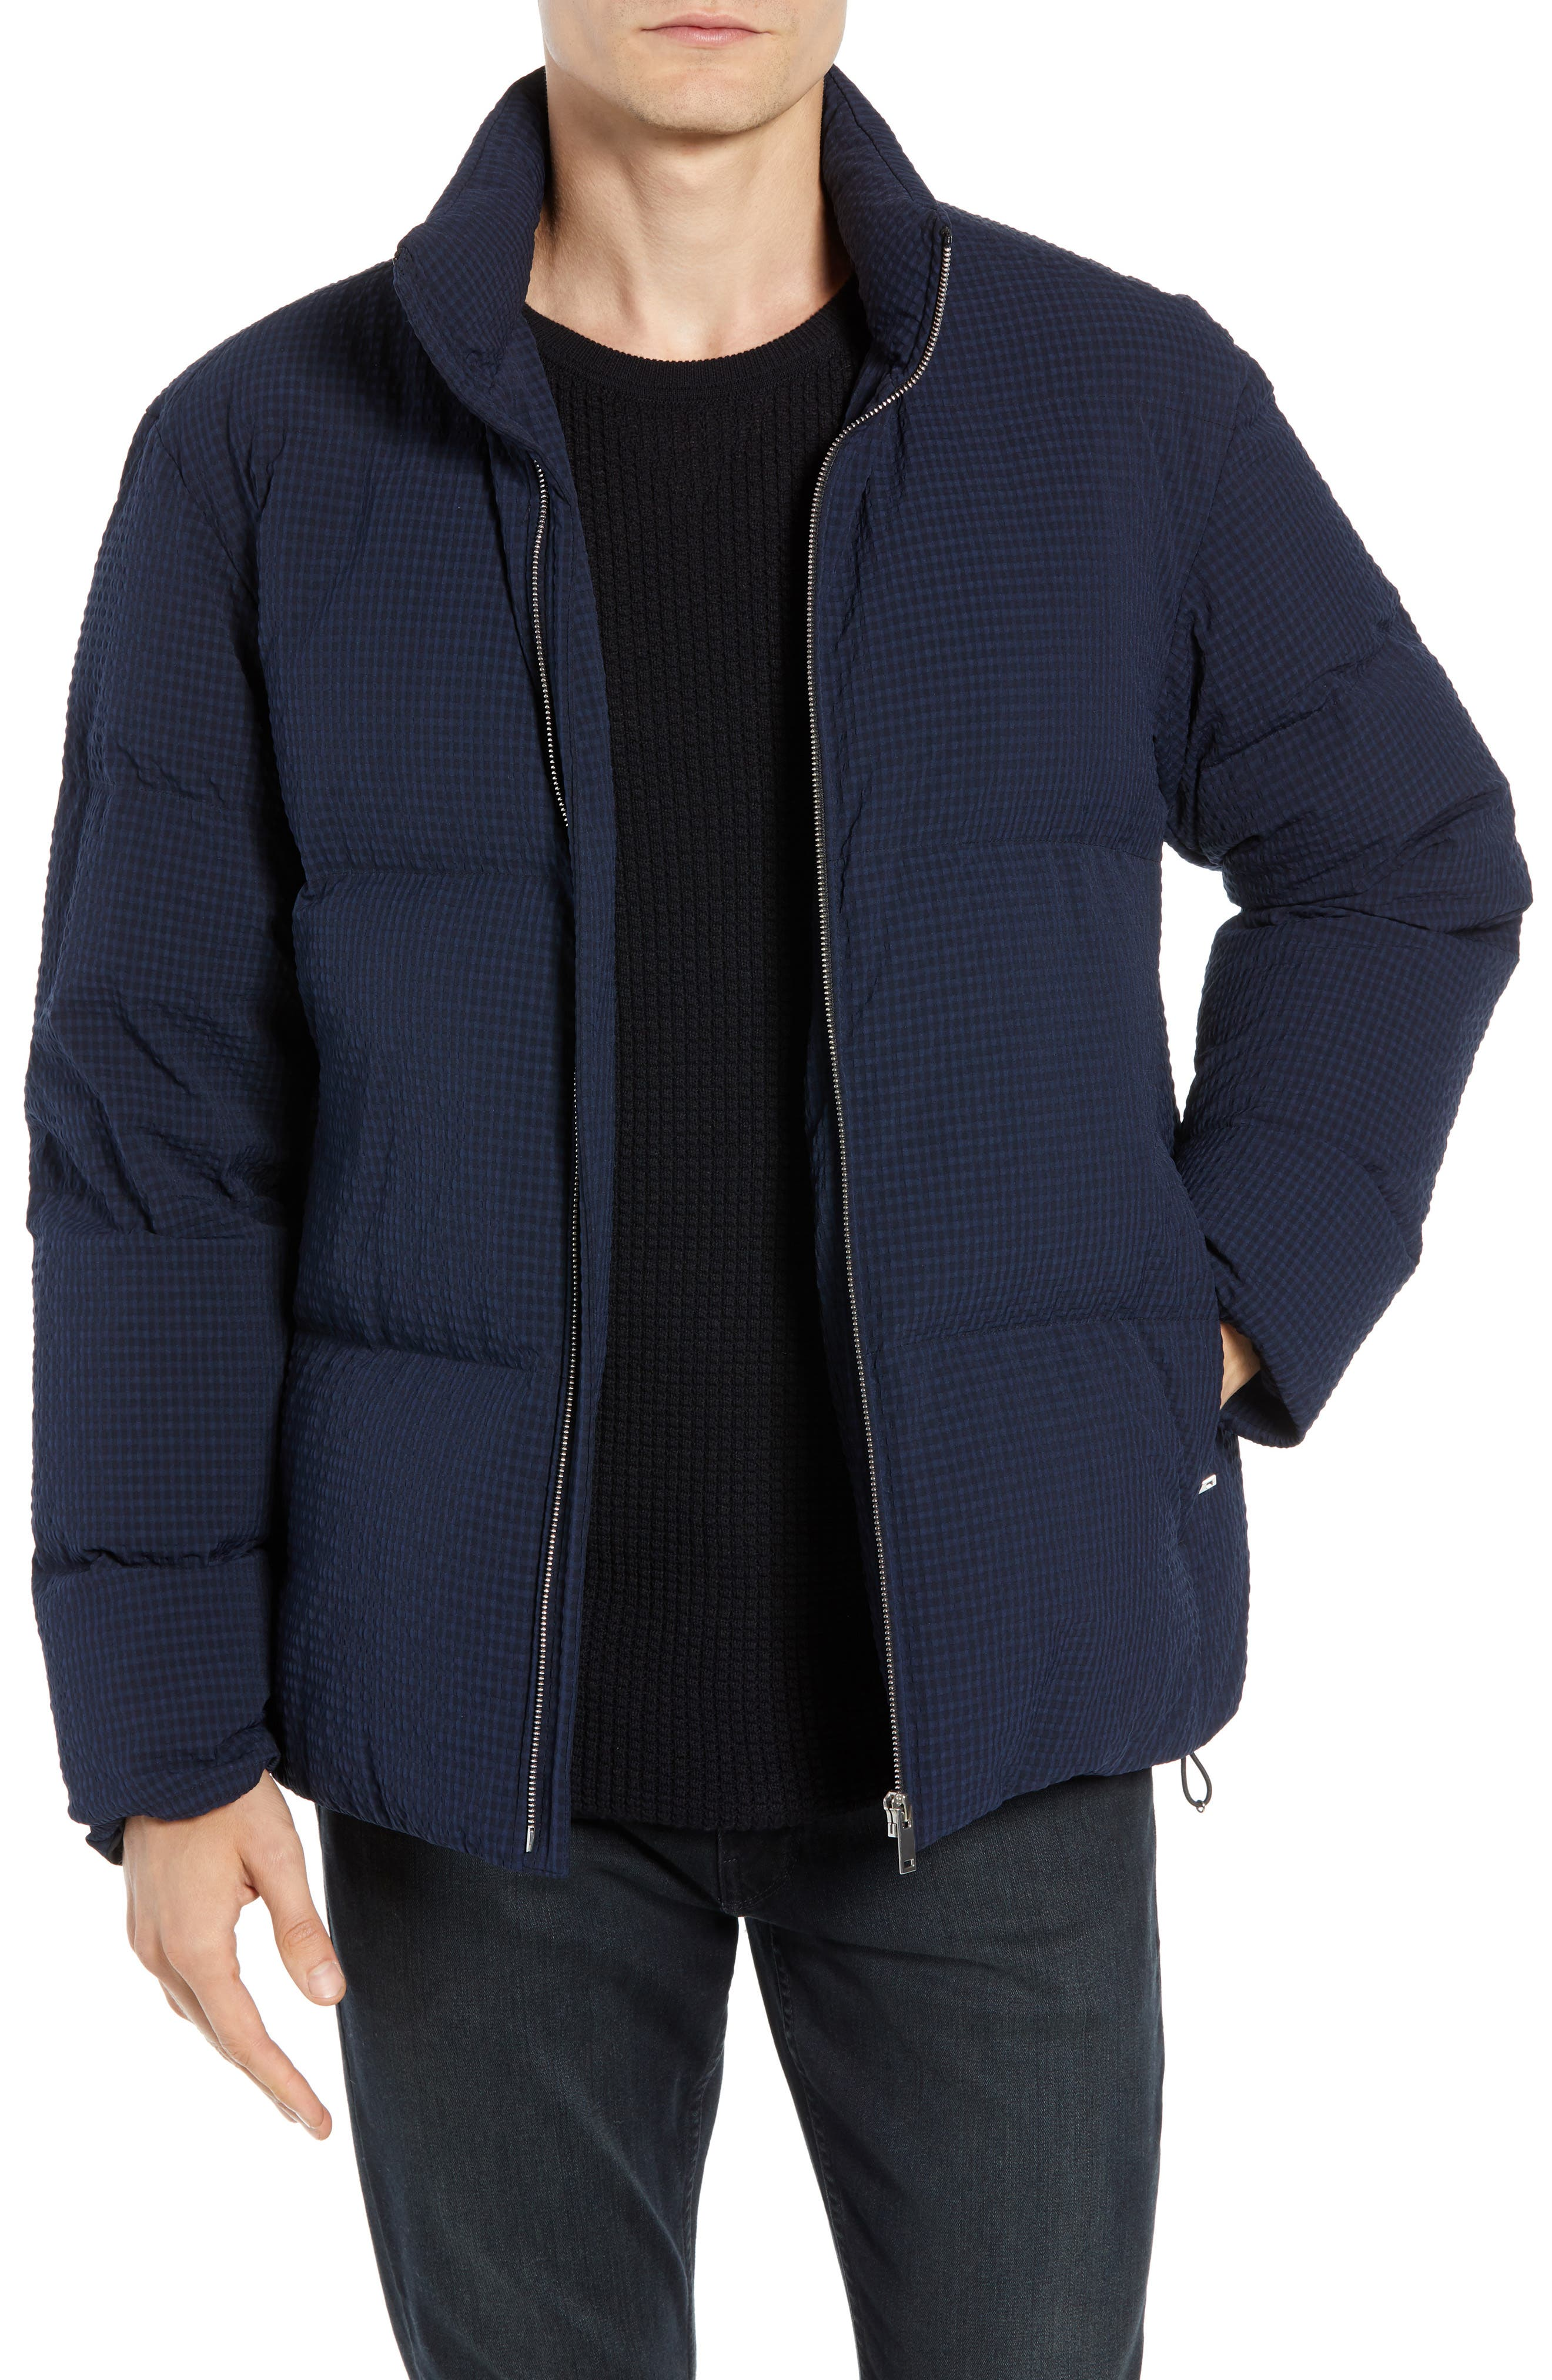 Fulton 3 Regular Fit Seersucker Puffer Jacket,                             Main thumbnail 1, color,                             ECLIPSE MULTI